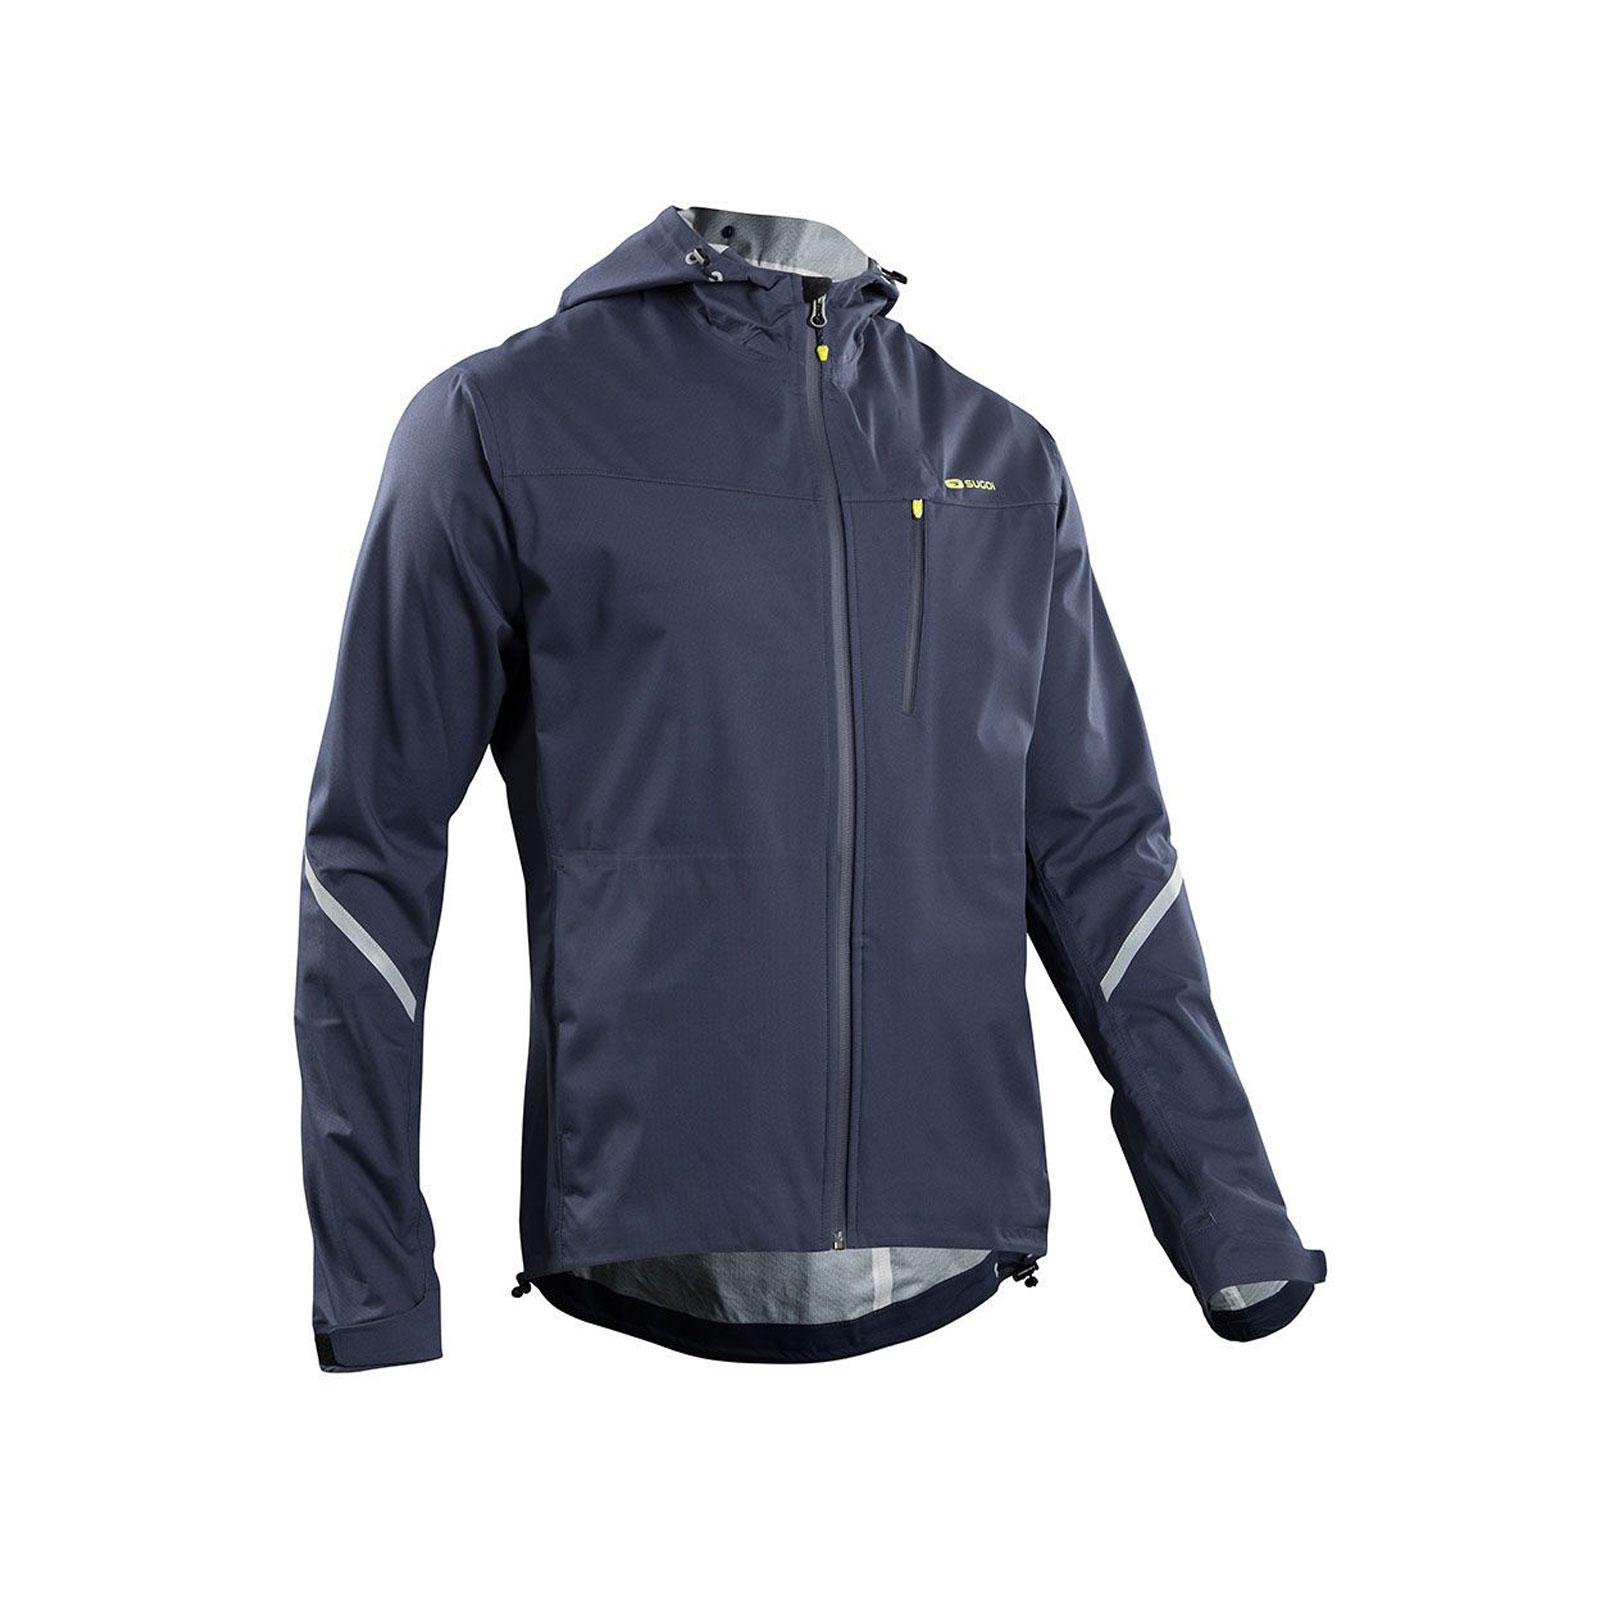 SUGOI Metro Waterproof Running Jacket With Hood Mens Blue XL | eBay